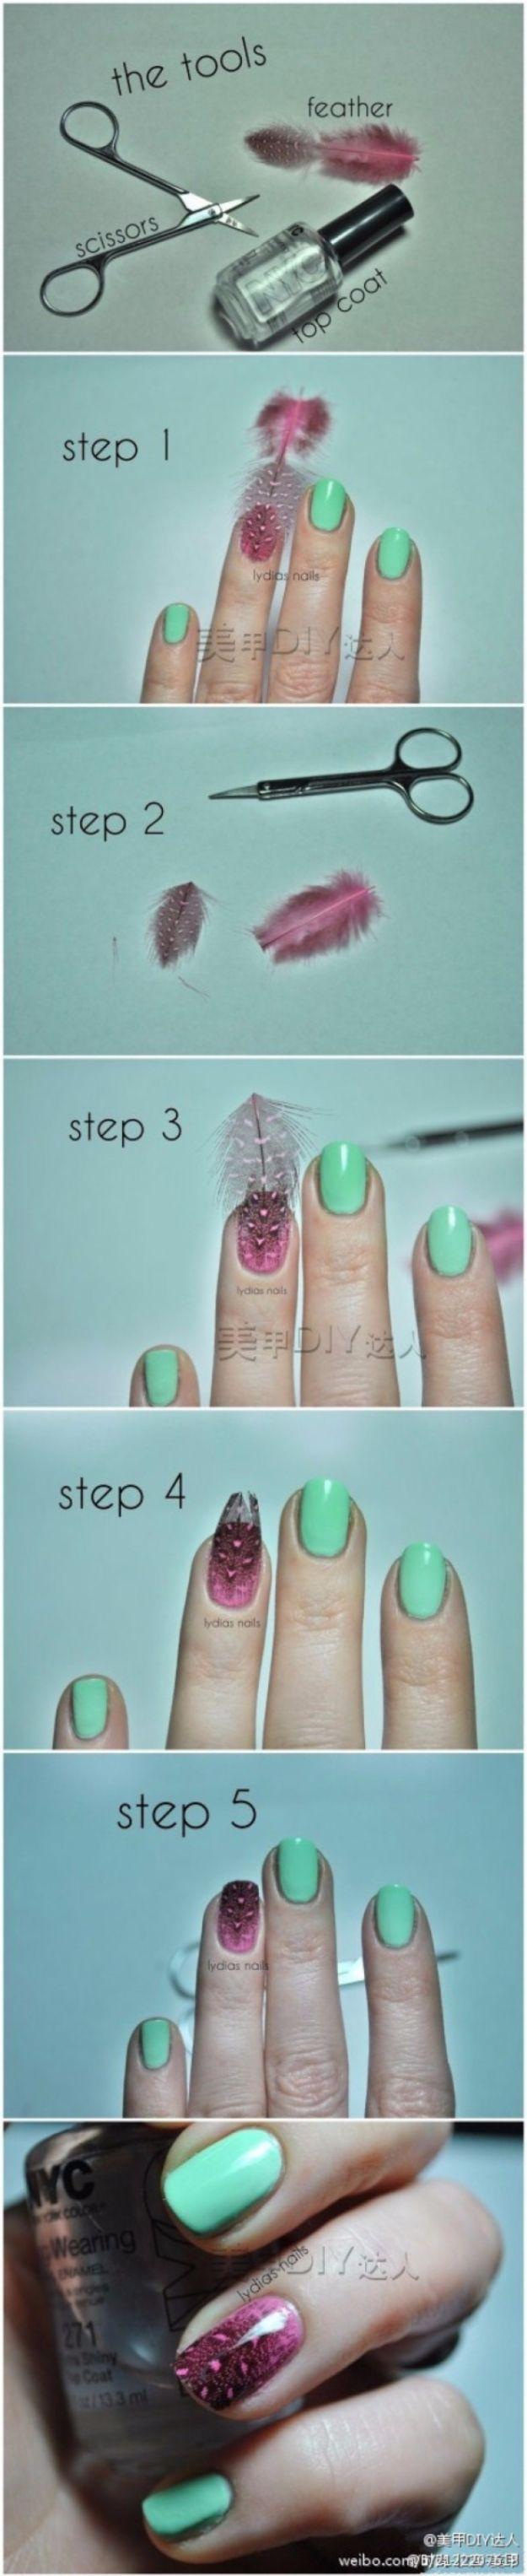 30 best Nail Art Designs images on Pinterest | Nail scissors, Nail ...